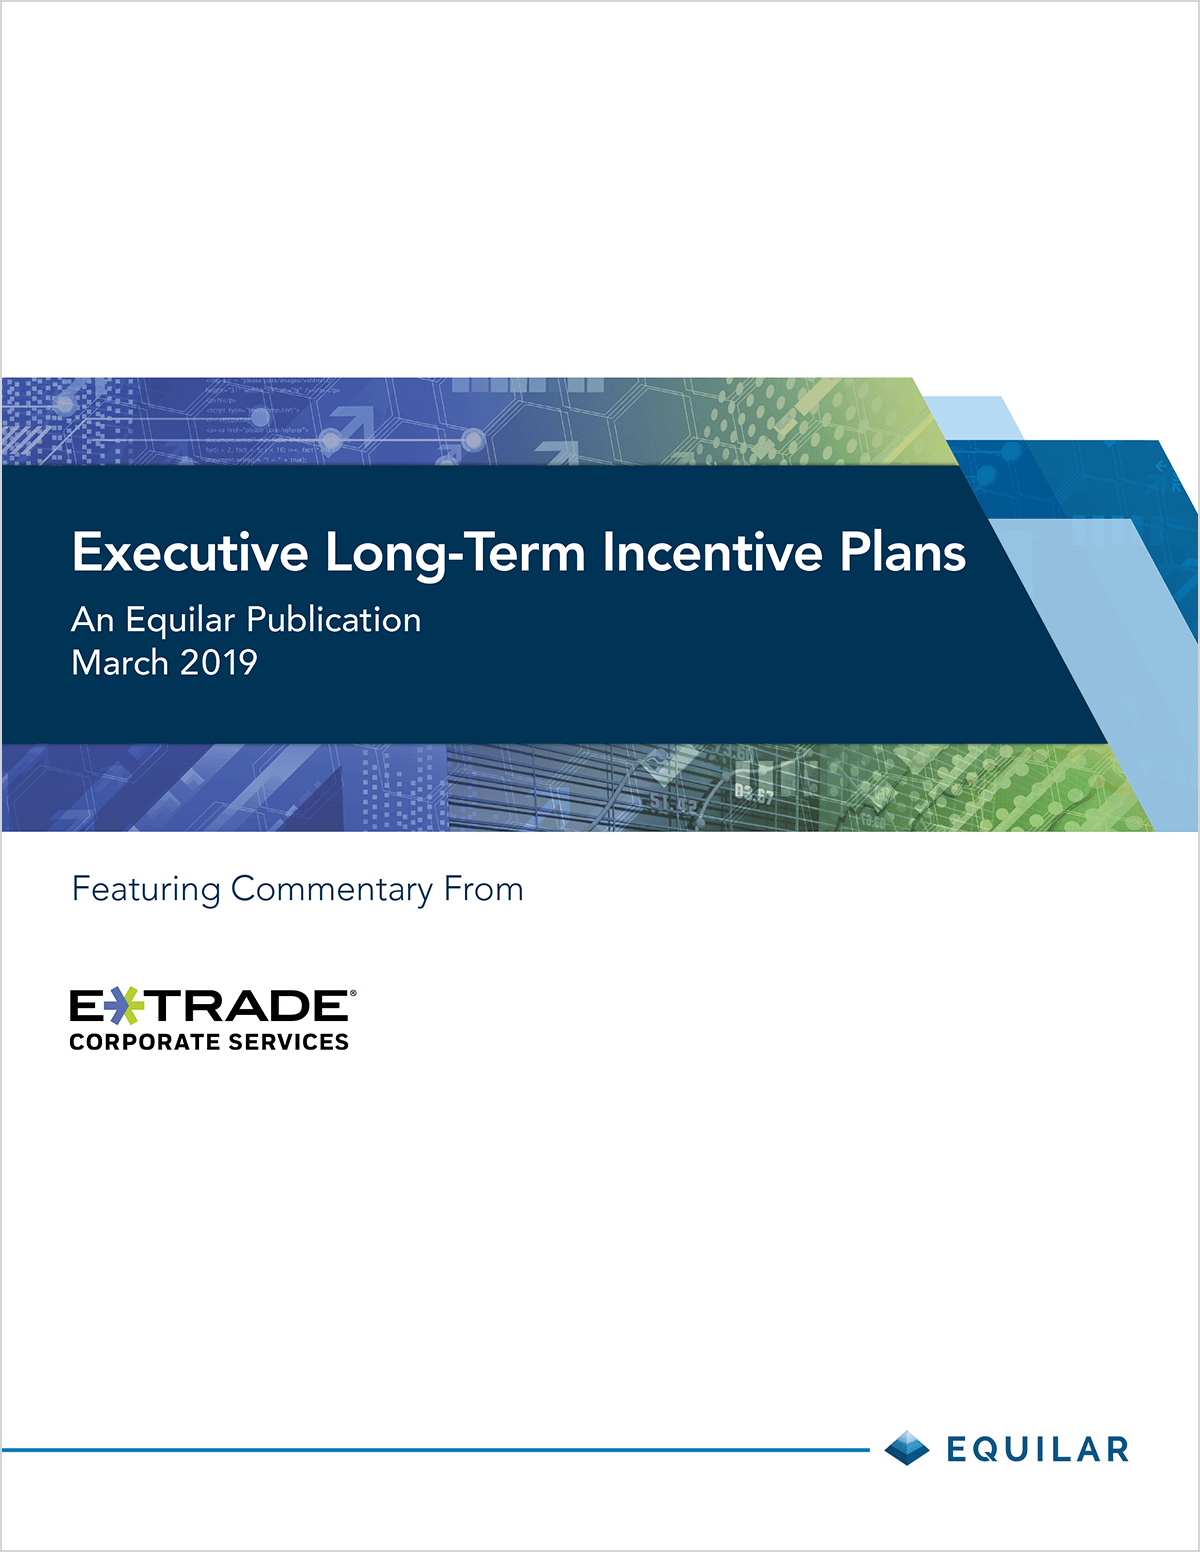 Equilar | Executive Long-Term Incentive Plans